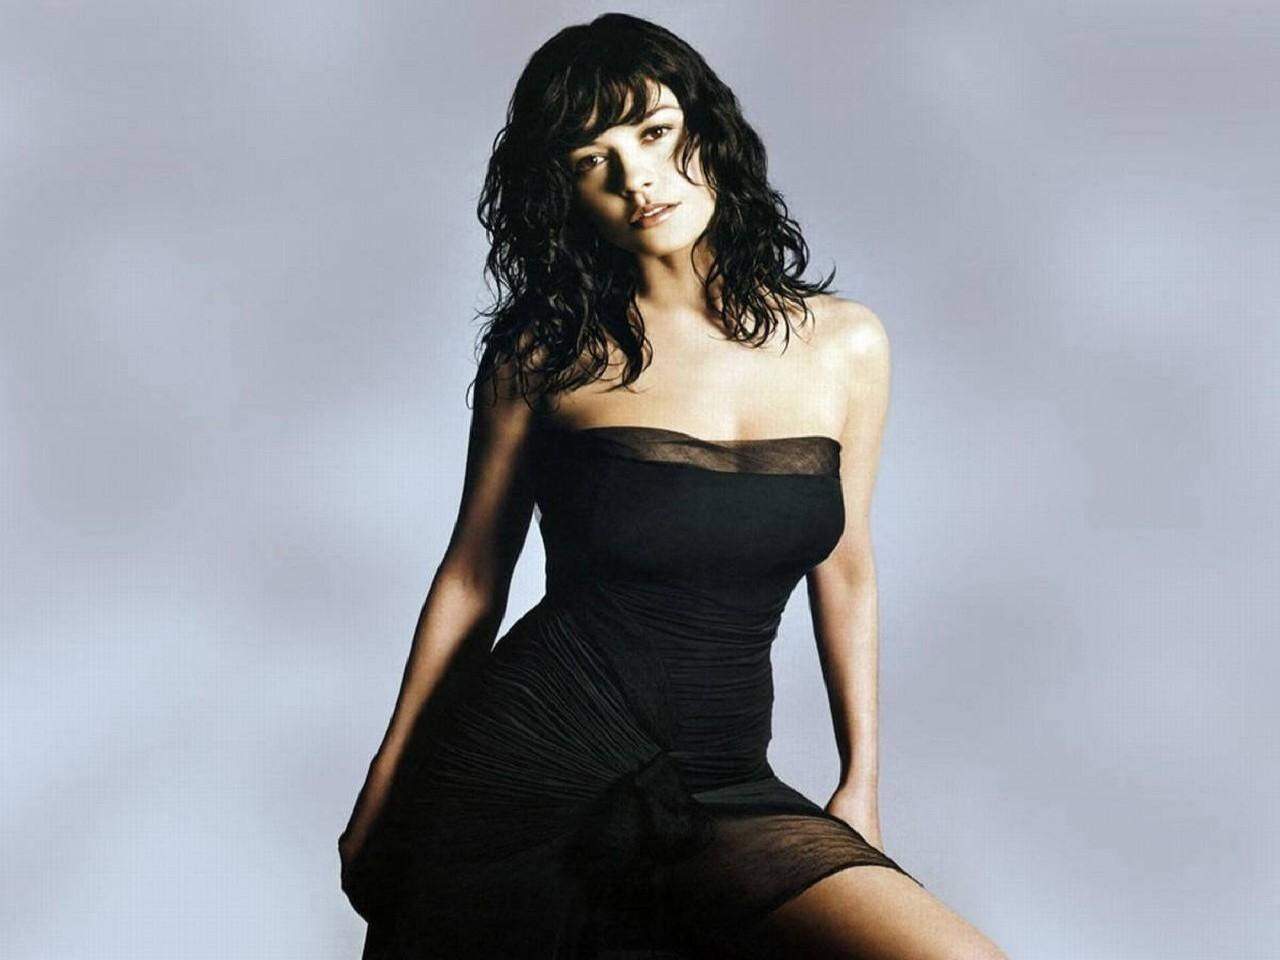 Wallpaper di Catherine Zeta-Jones 13